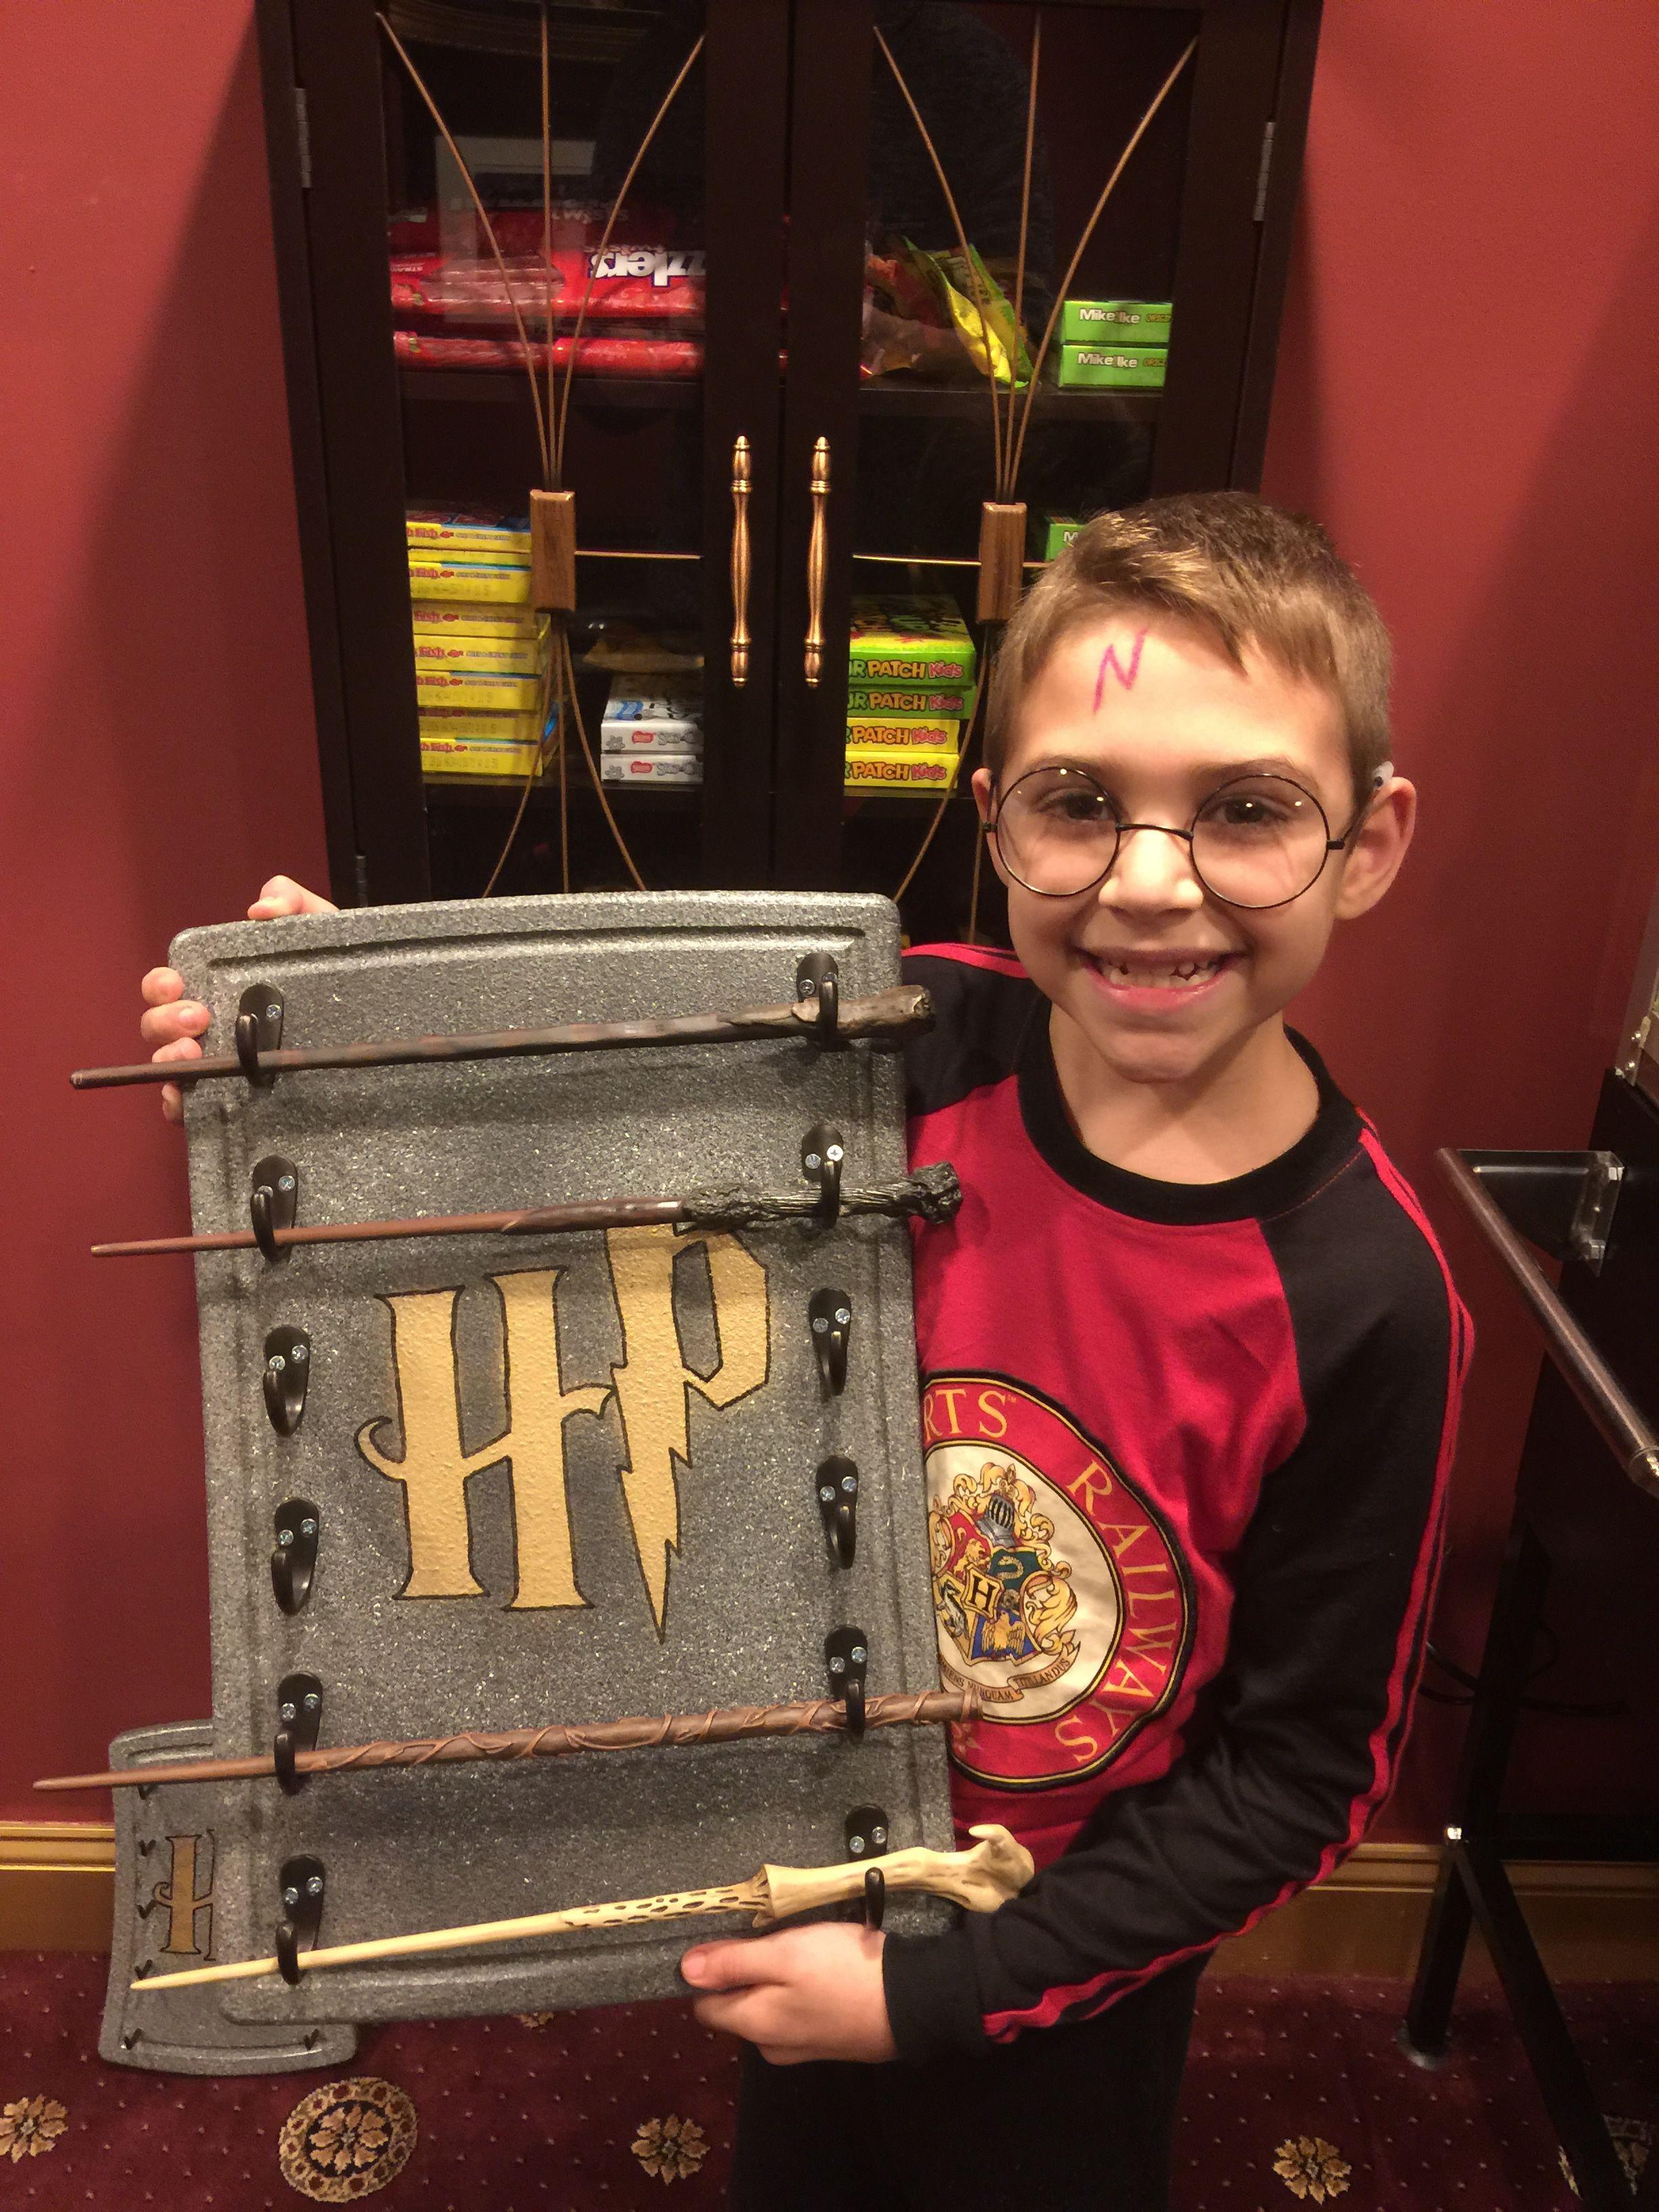 Harry Potter Wand Holder | Harry Potter Diy | Pinterest ...